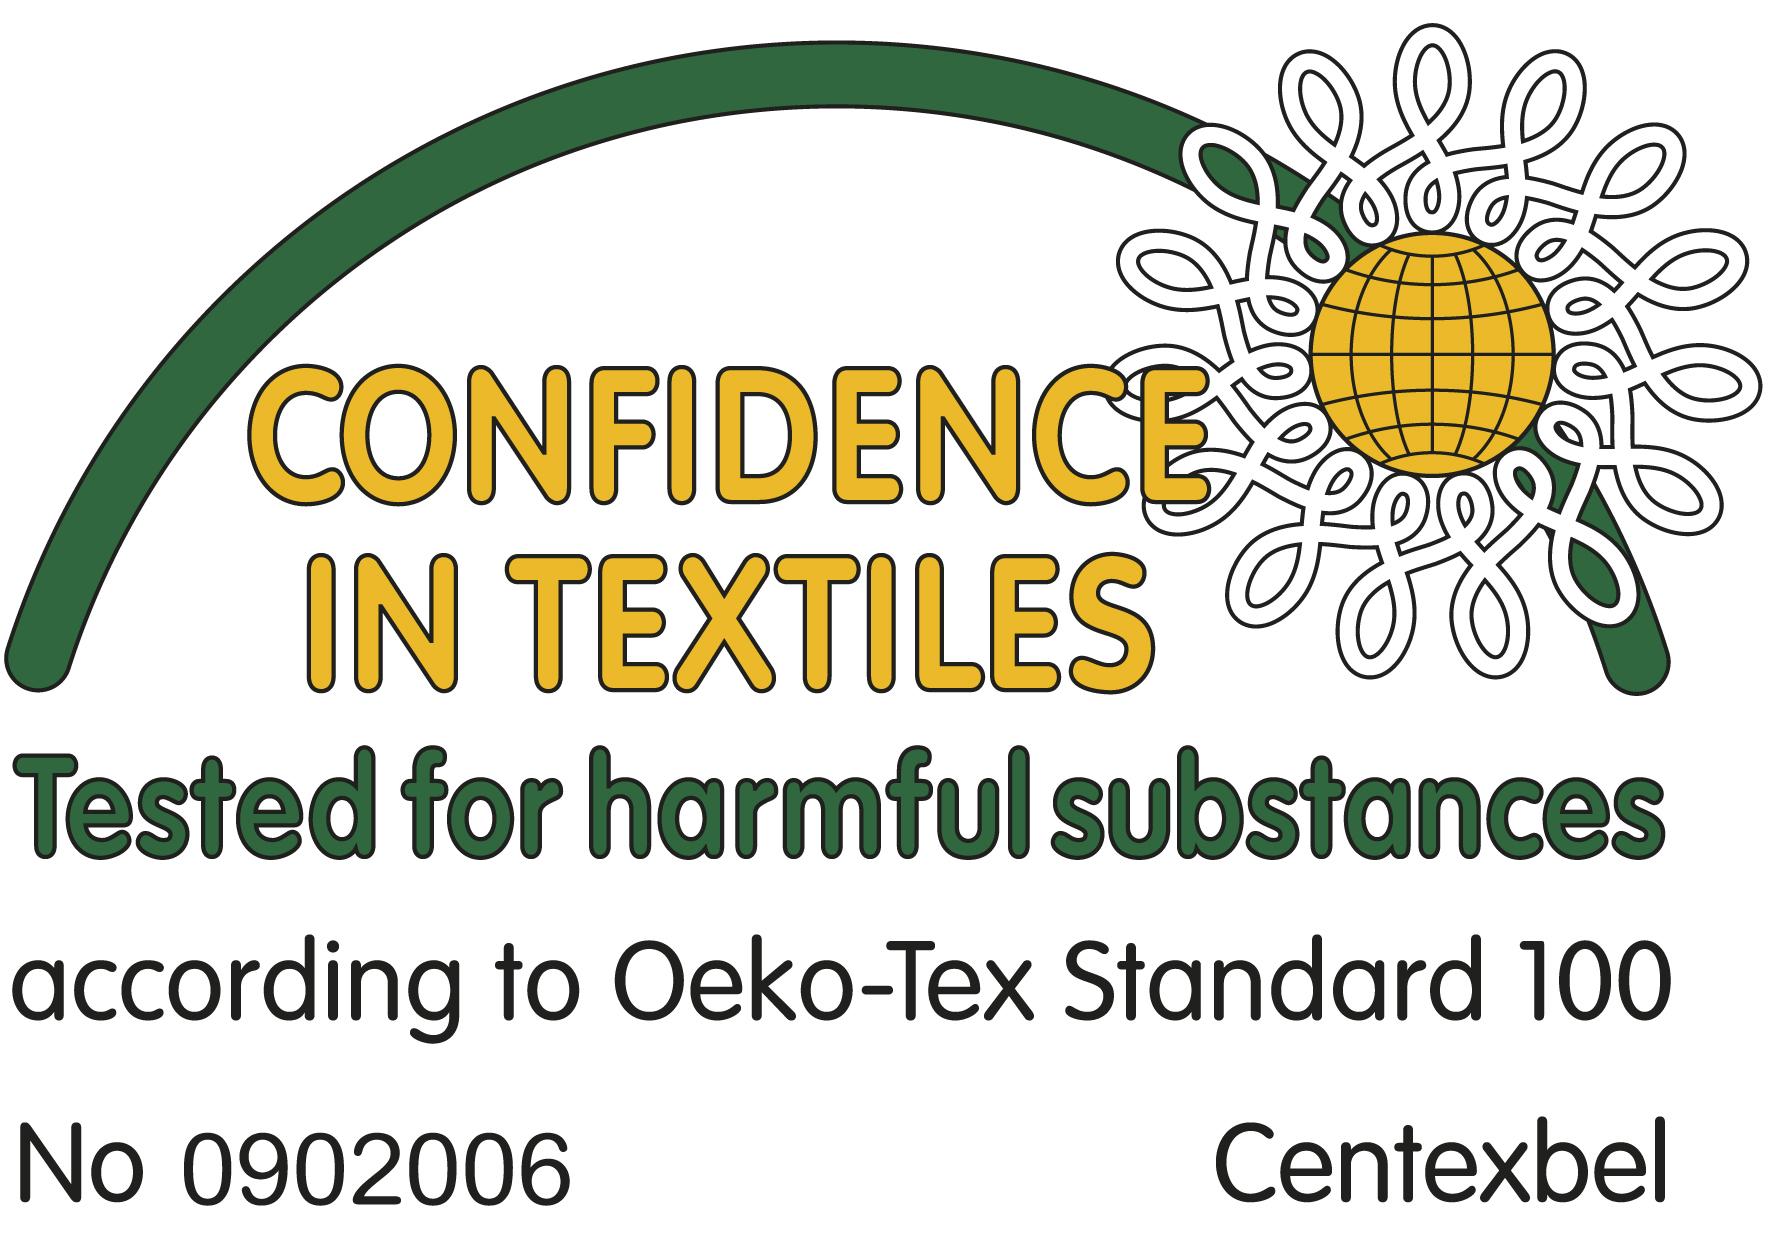 logo-confidence-oko-tex-lieven-pauwels.jpg